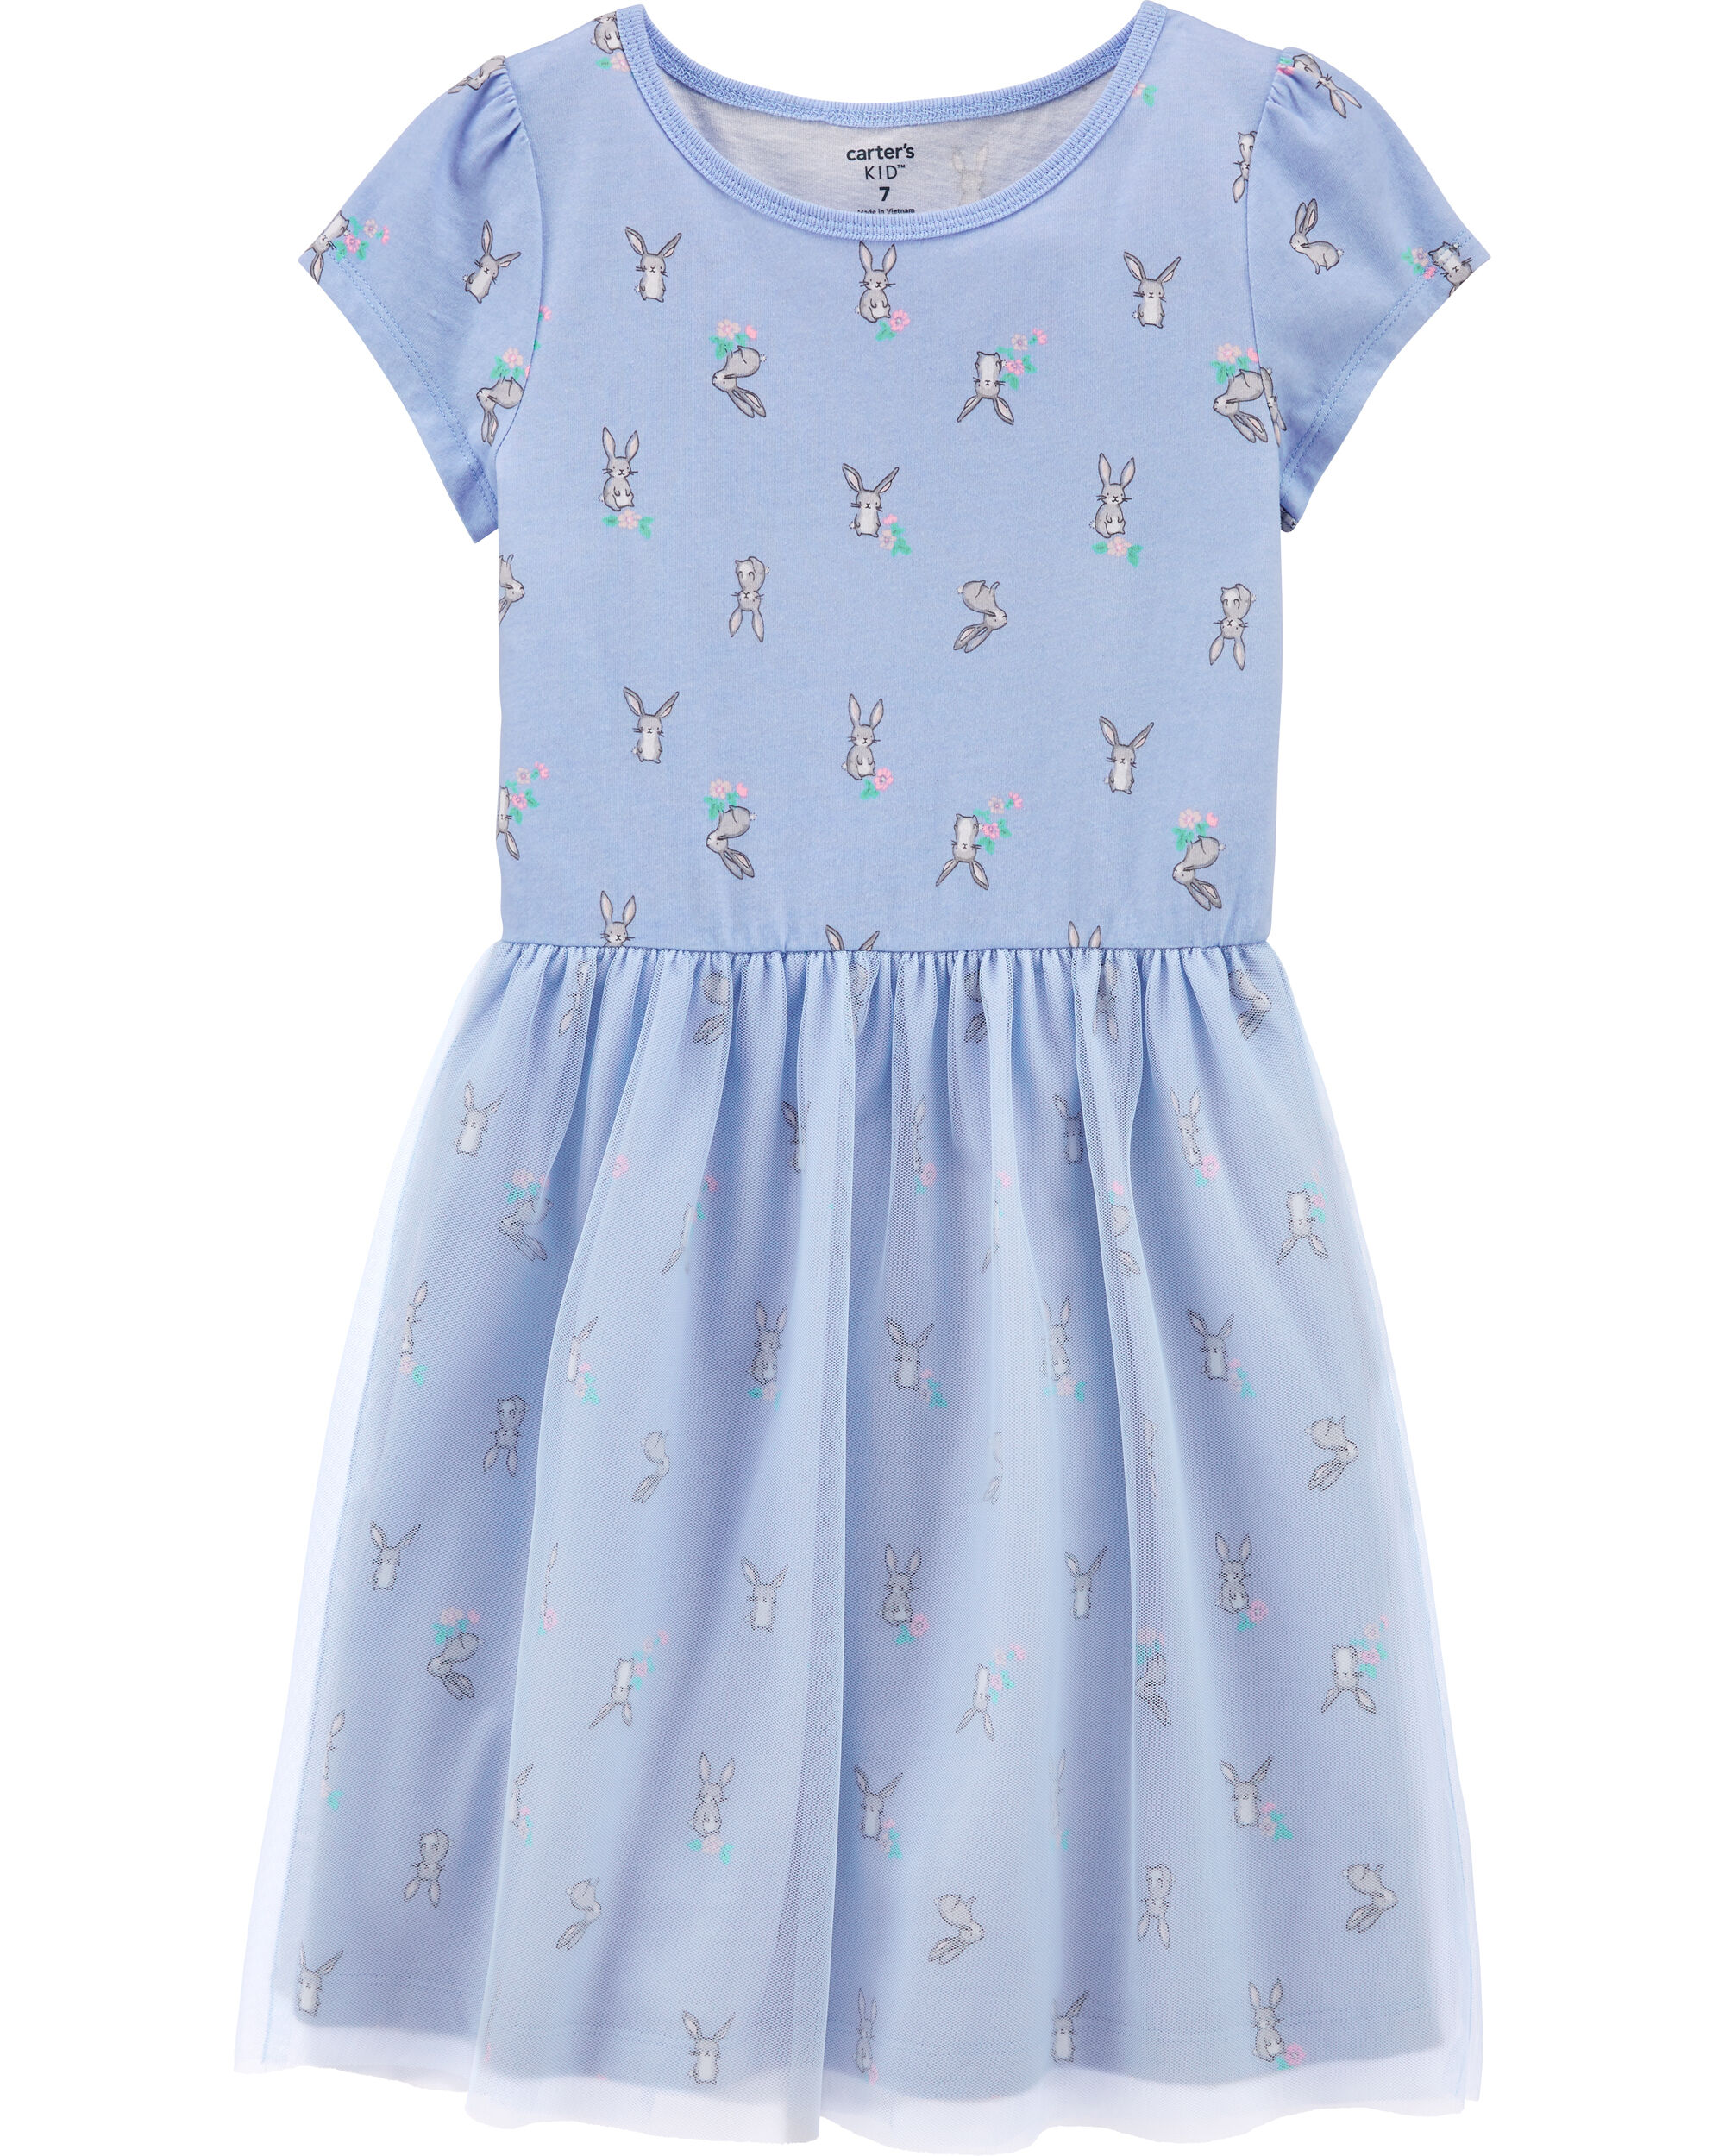 *CLEARANCE* Bunny Tutu Jersey Dress